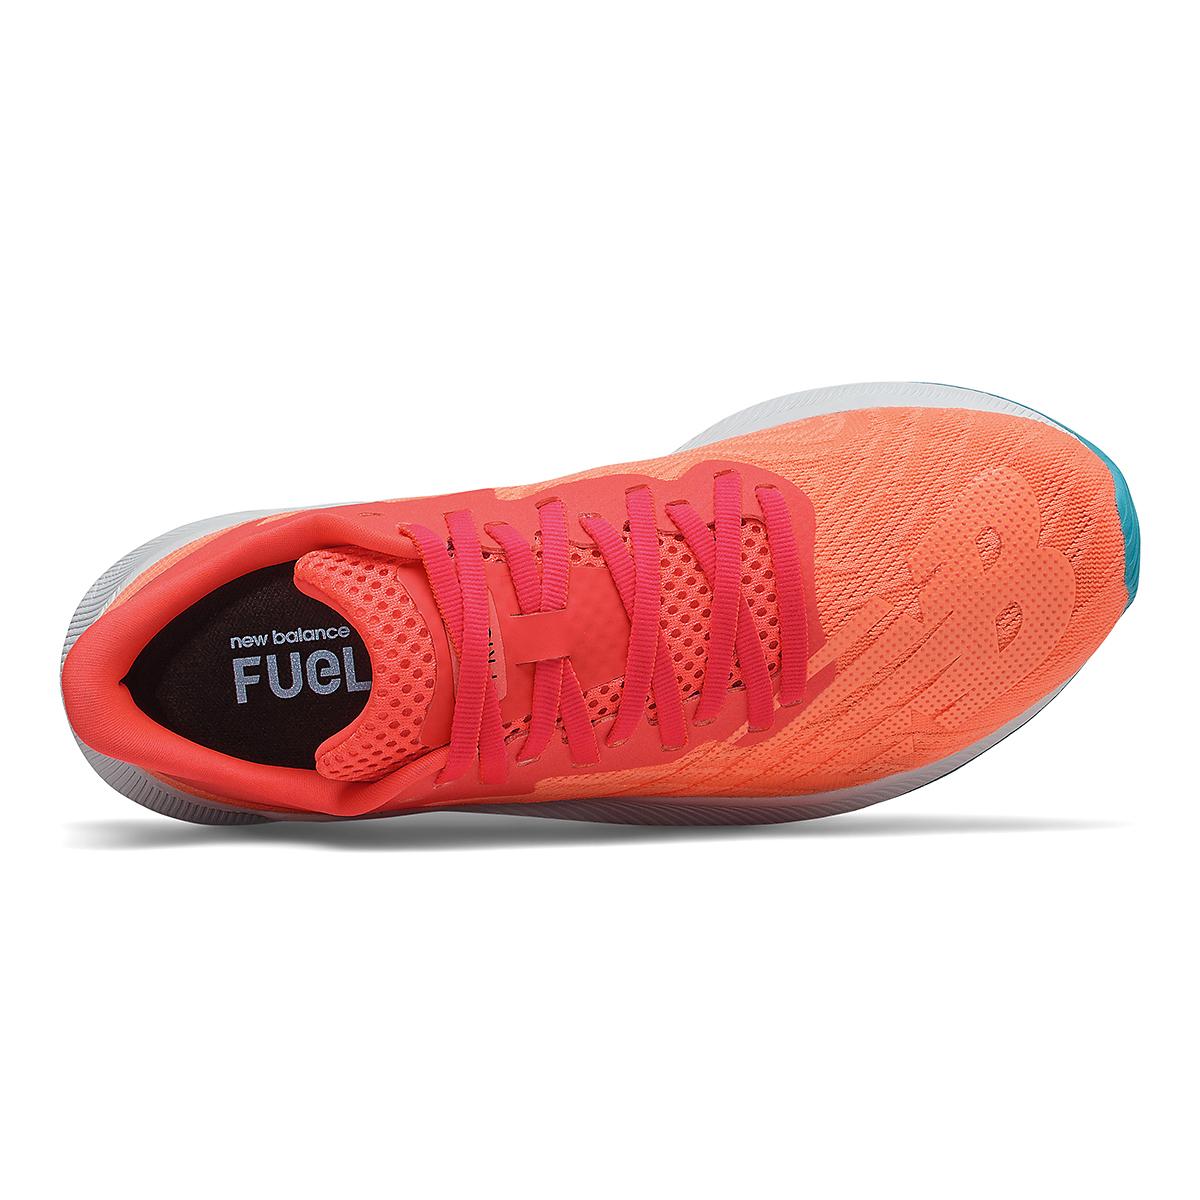 Women's New Balance Fuelcell Prism Running Shoe - Color: Vivid Coral/Citrus - Size: 5 - Width: Regular, Vivid Coral/Citrus, large, image 3